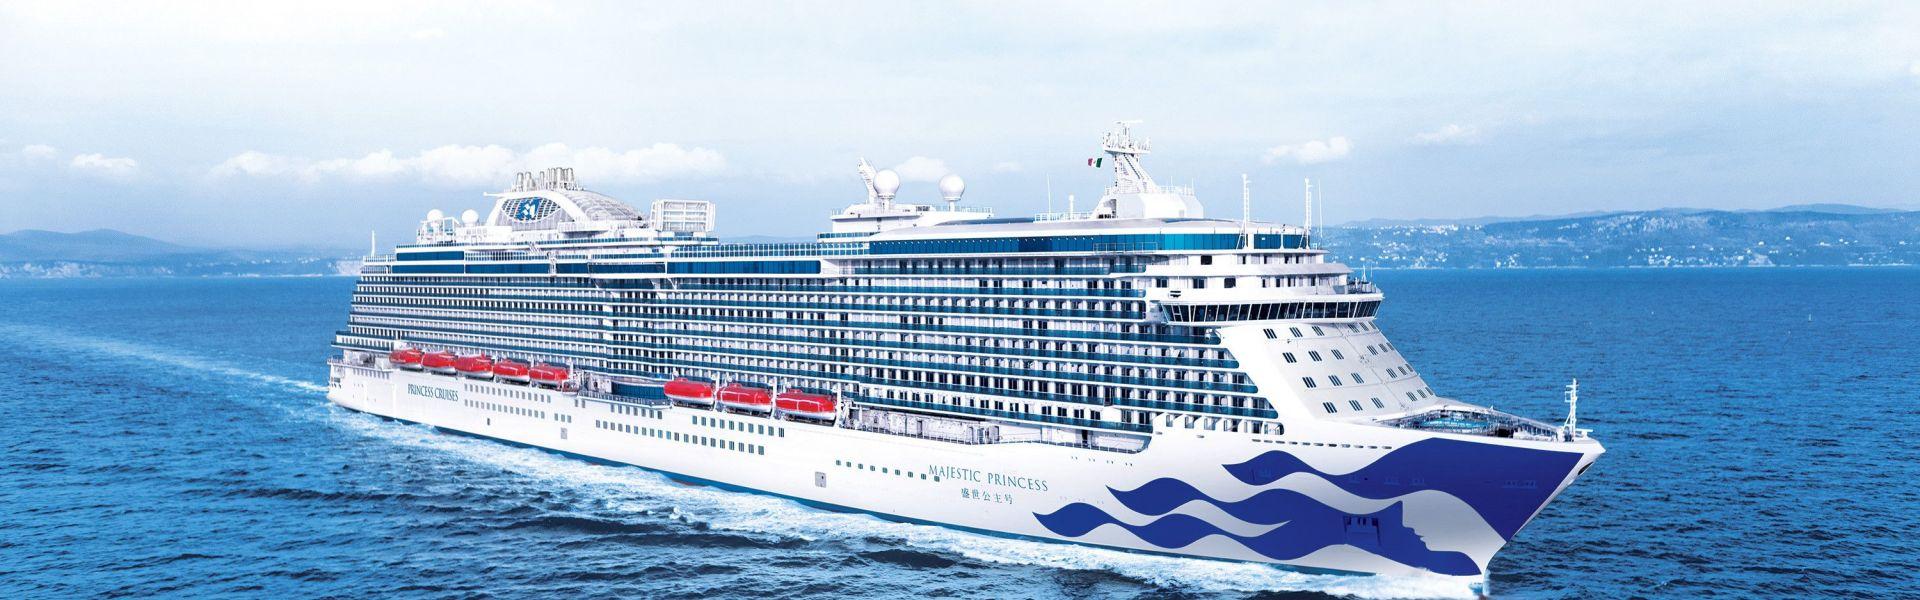 Croaziera 2018 - Australia si Noua Zeelanda (Auckland) - Princess Cruises - Majestic Princess - 12 nopti